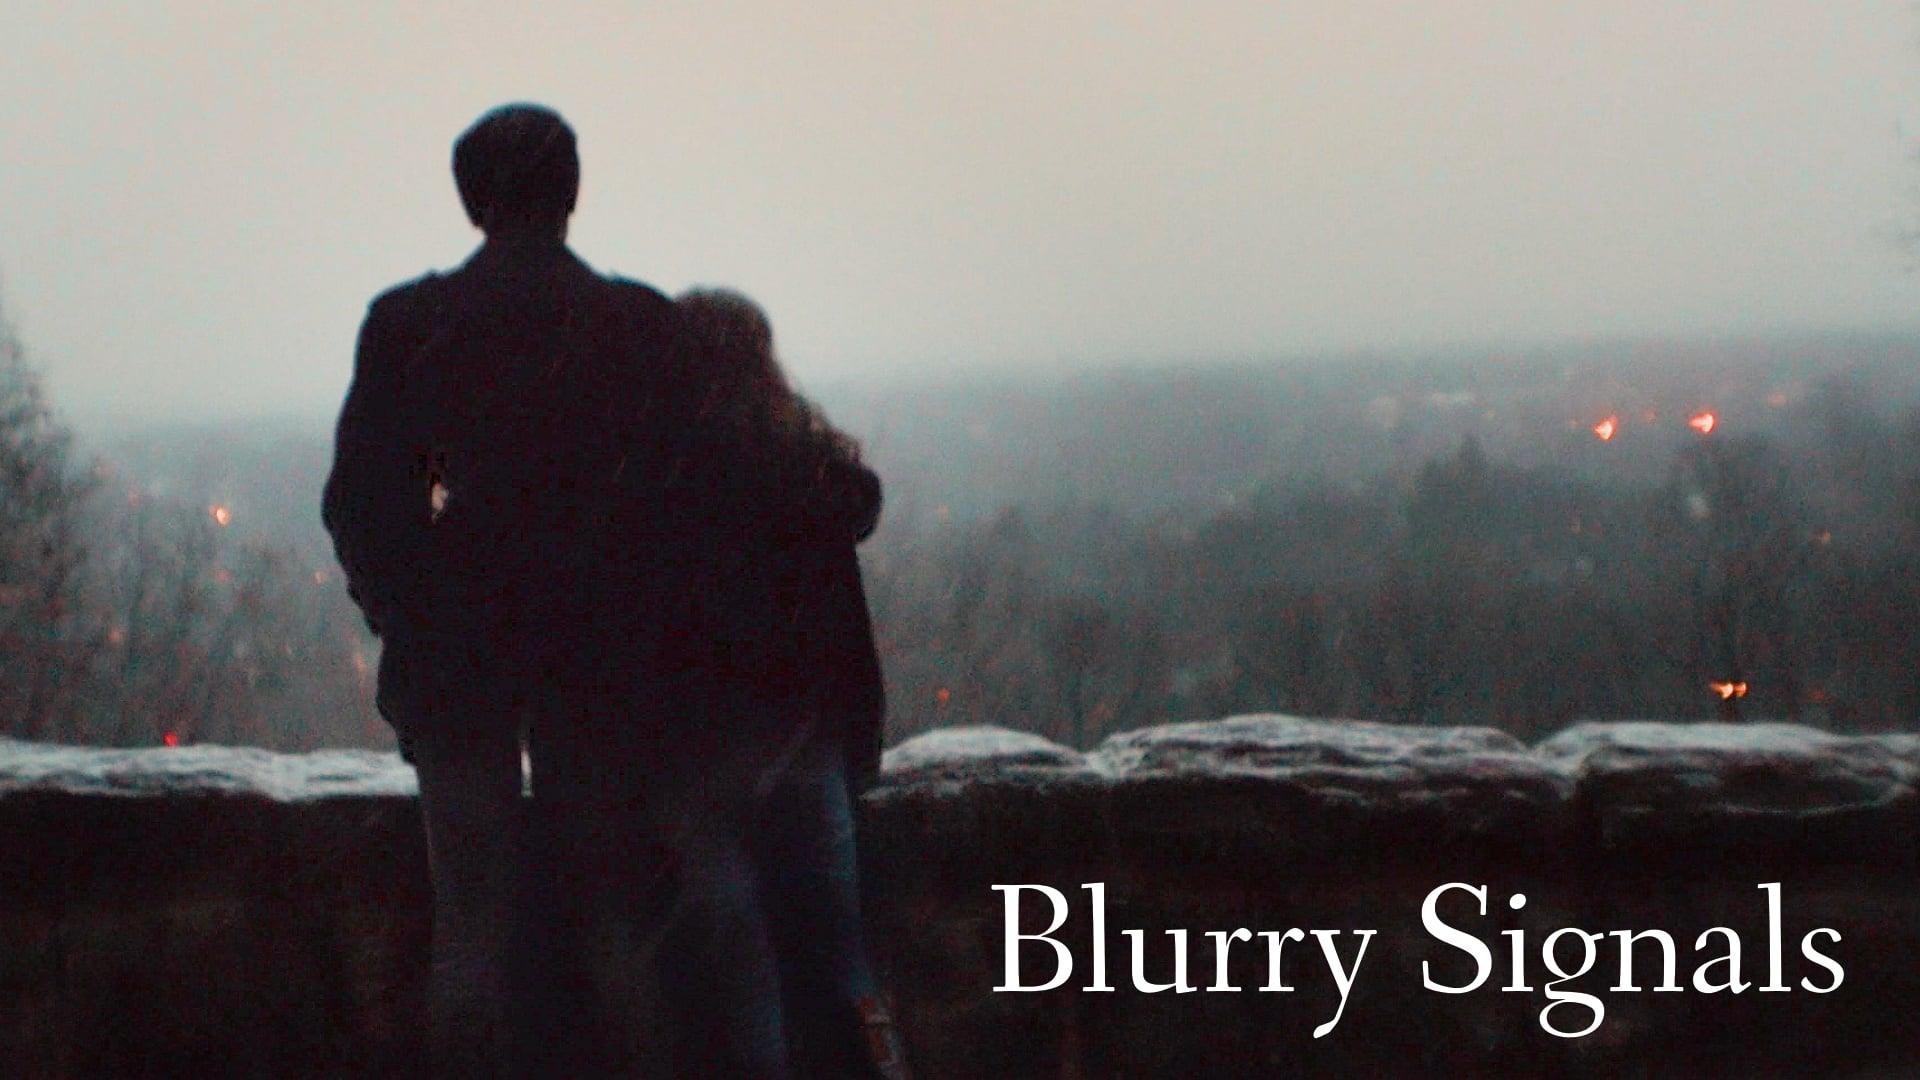 Blurry Signals (Short Film)